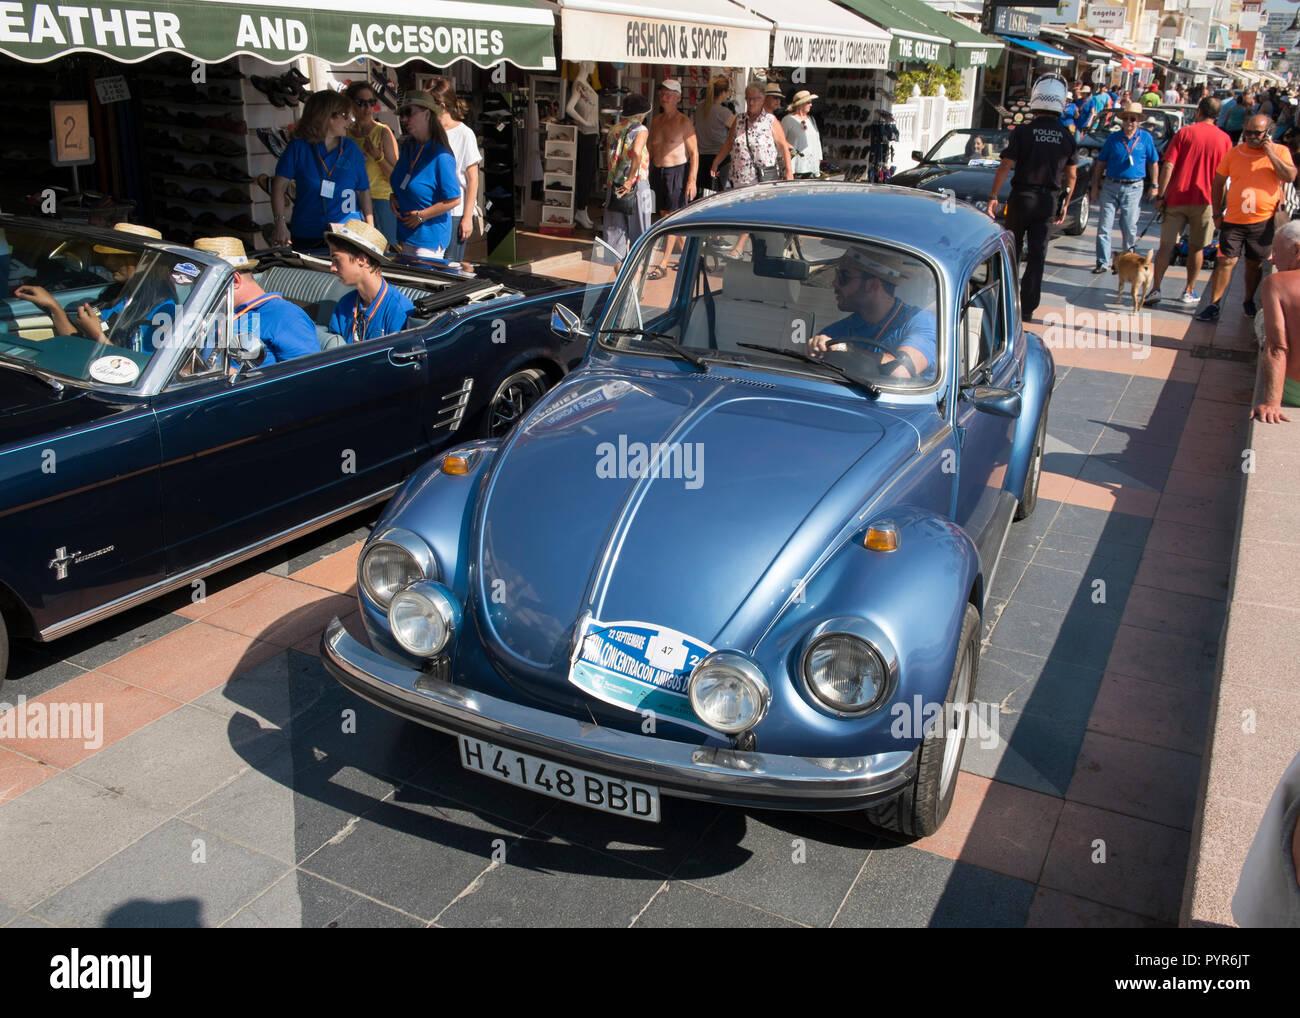 Classic Volkswagen Beetle. Classic car meeting in Torremolinos, Málaga, Spain. Stock Photo